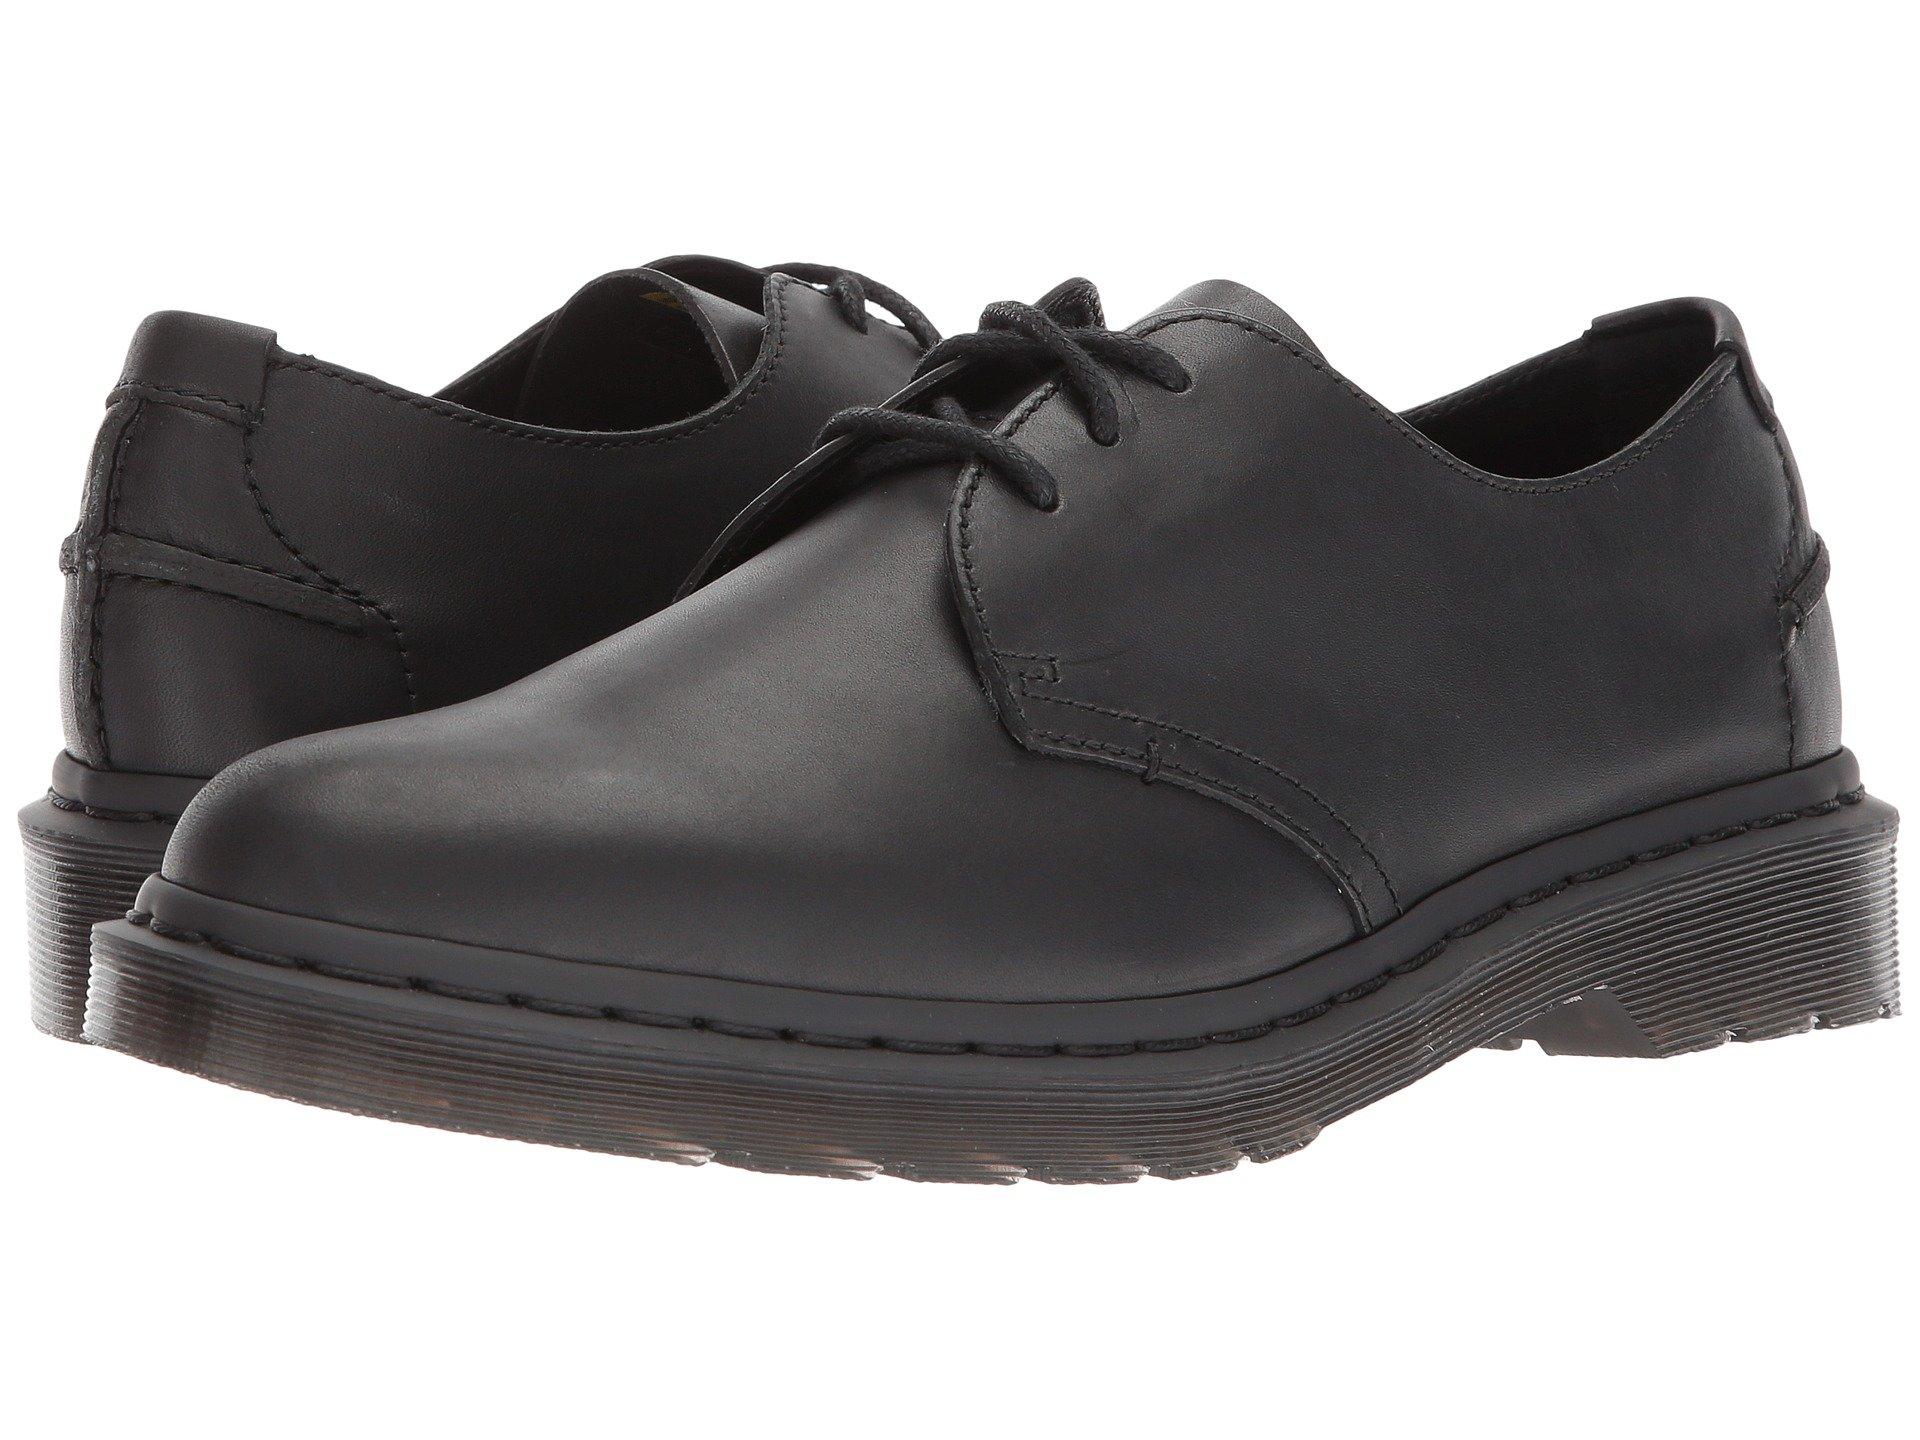 Calzado tipo Oxford para Hombre Dr. Martens 1461 Decon 3-Eye Shoe  + Dr. Martens en VeoyCompro.net